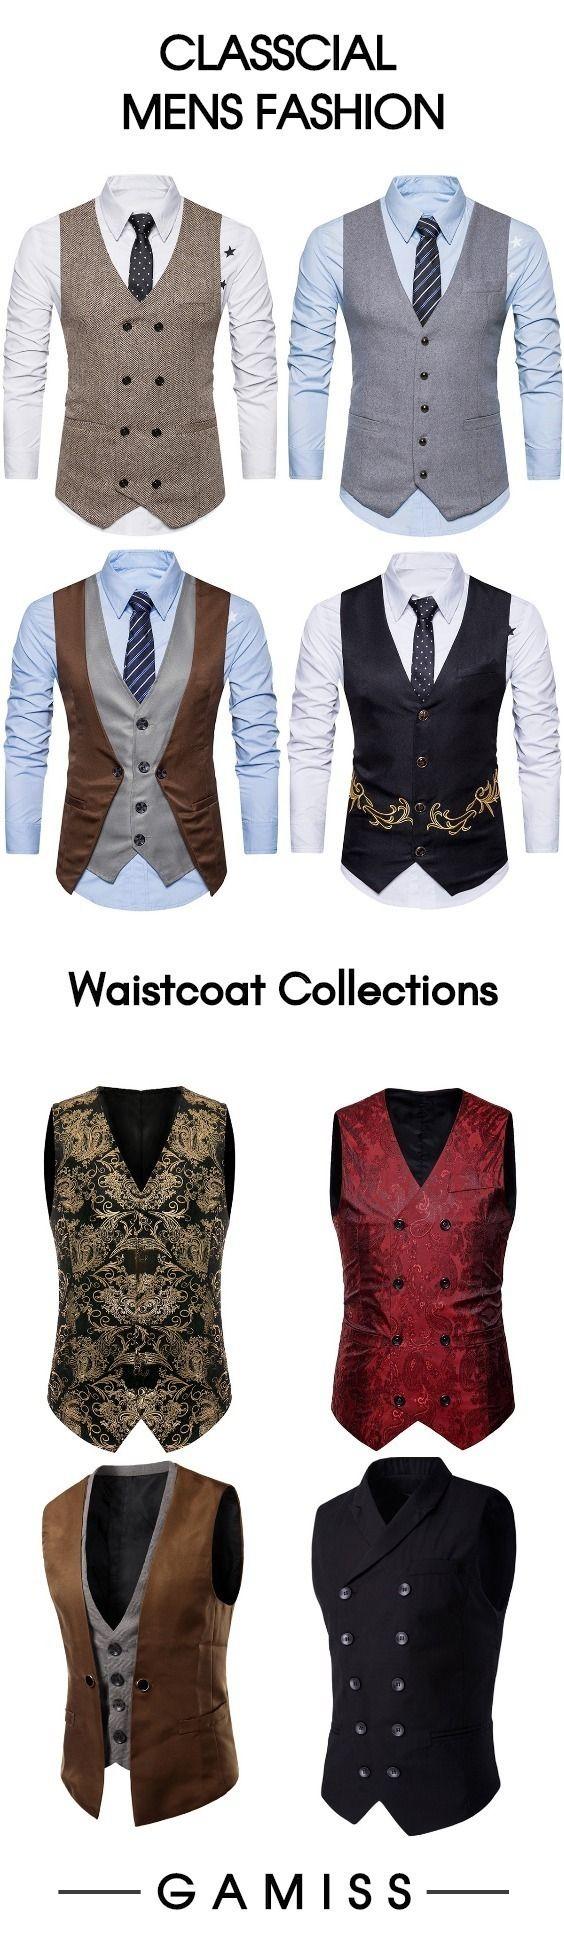 Waistcoats for men